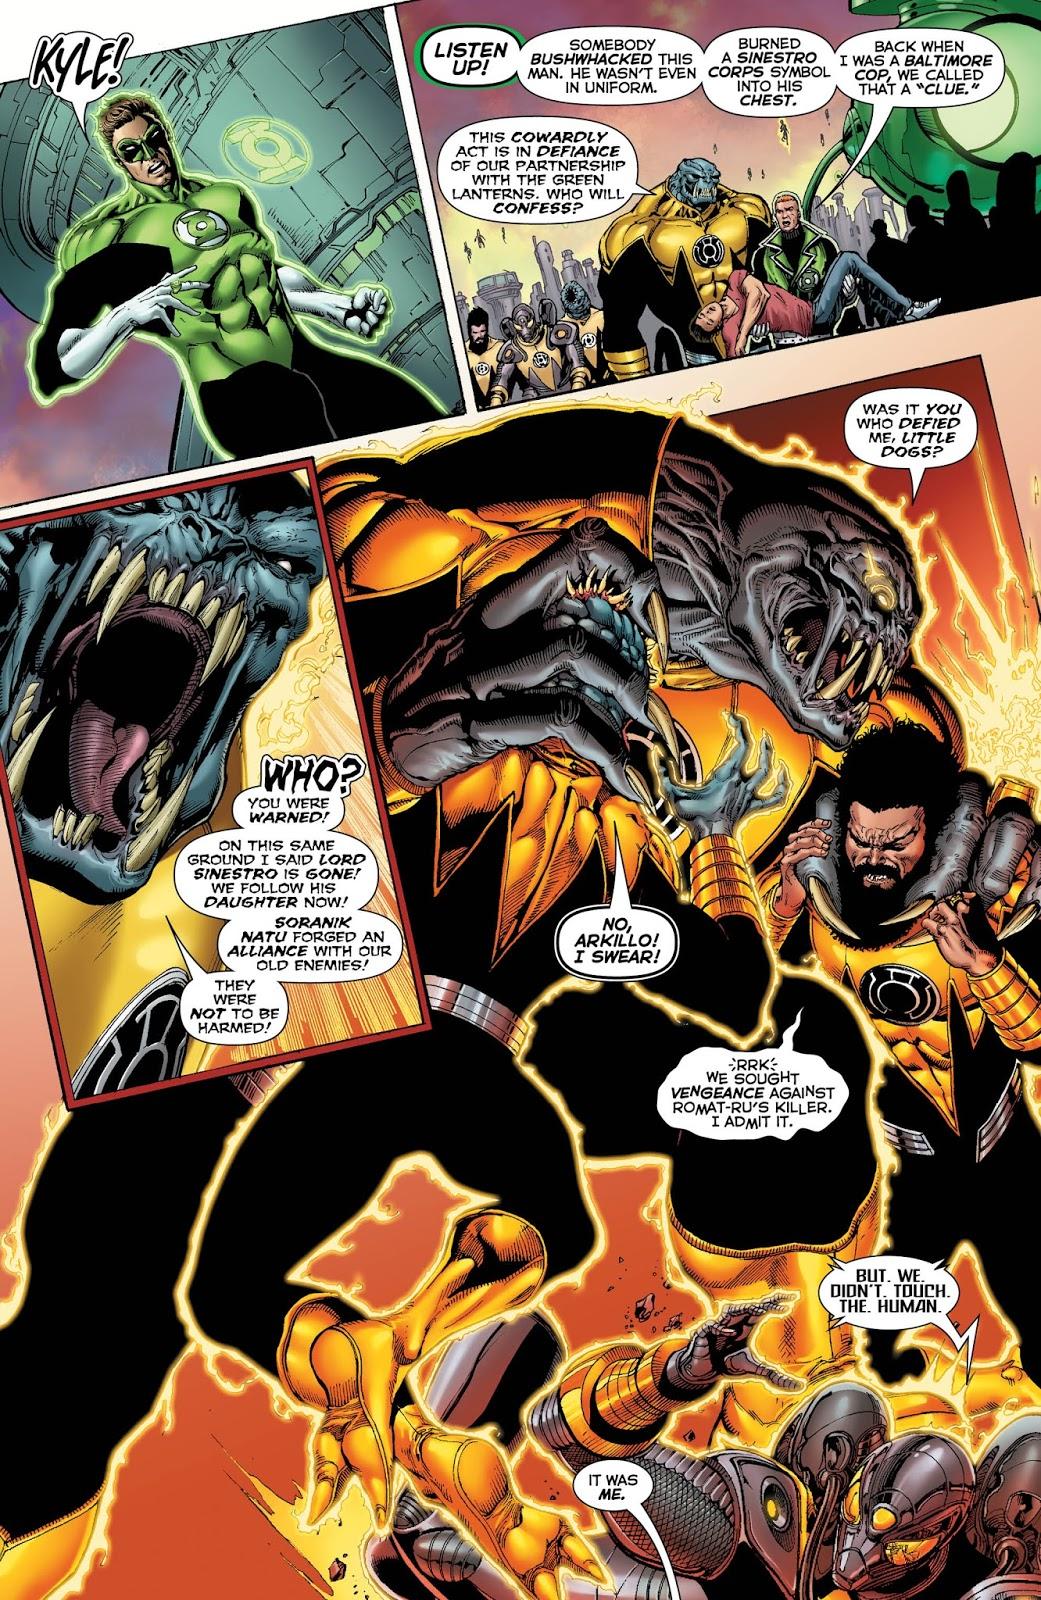 Weird Science Dc Comics Hal Jordan And The Green Lantern Corps 25